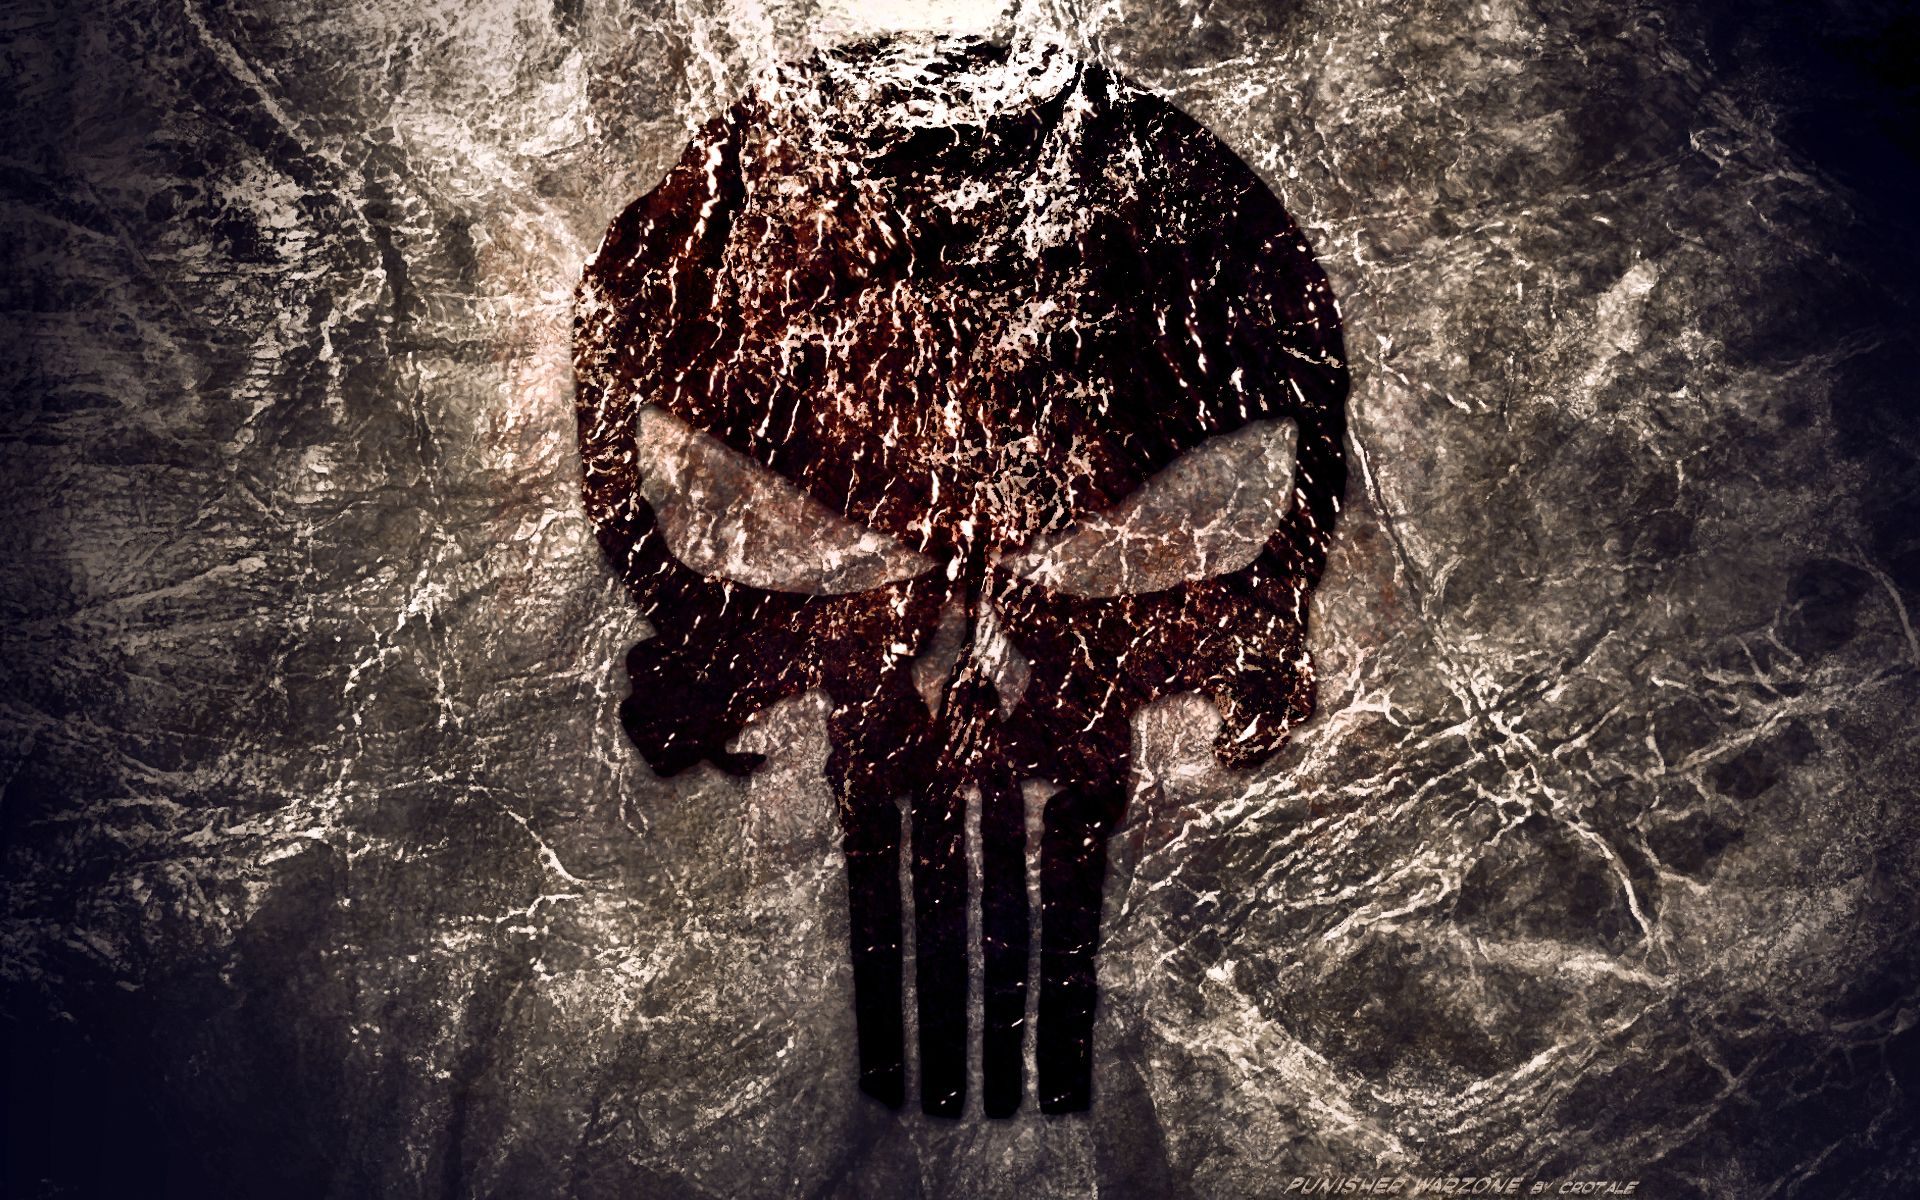 Wonderful Wallpaper Marvel Punisher - 45b46d1bfe7cc04662a04f7b4ac7ff96  Photograph_982031.jpg